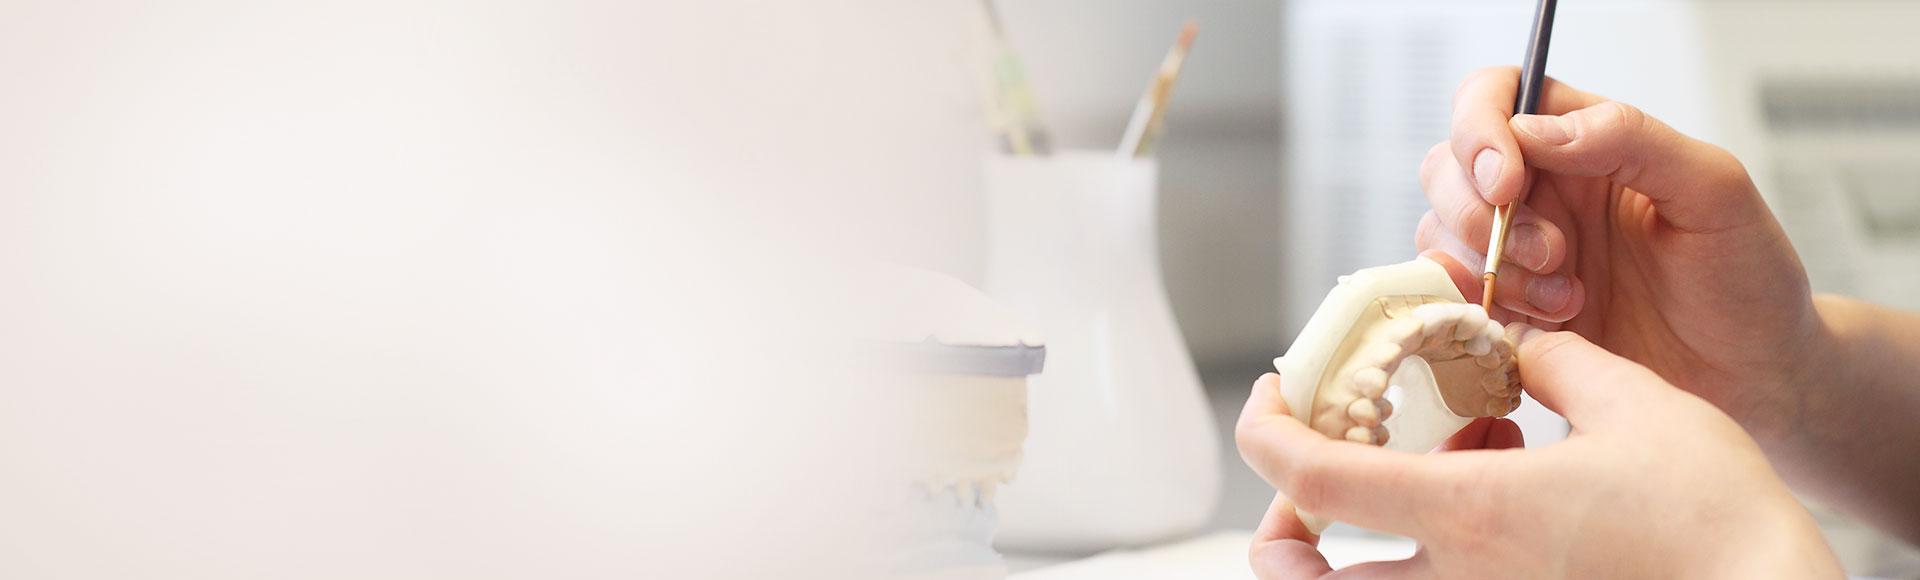 Dentallabor Praxisverbund Zahntechniker Zahnersatz Keramikkrone